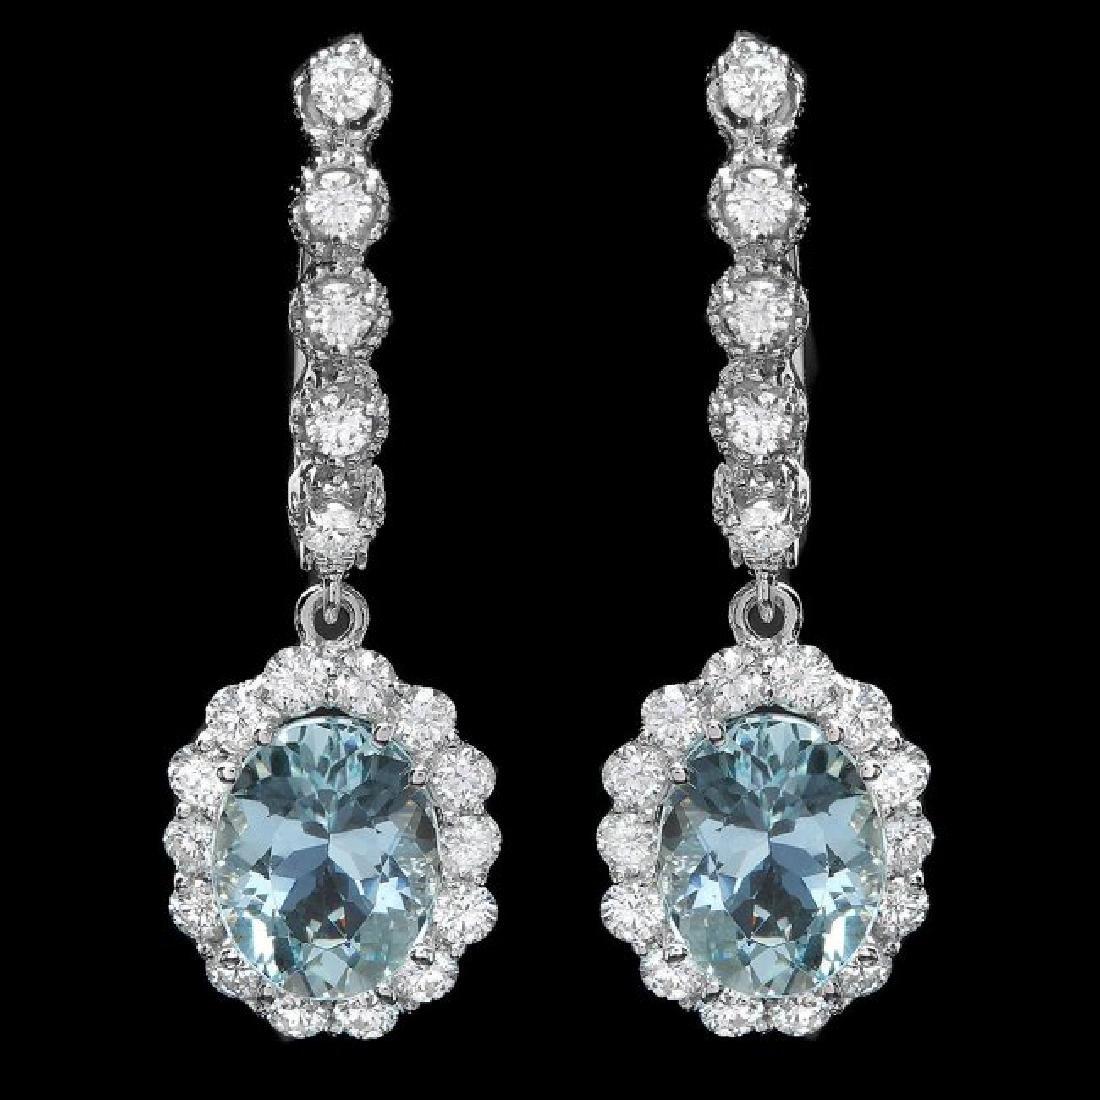 14k Gold 4ct Aquamarine 1.00ct Diamond Earrings